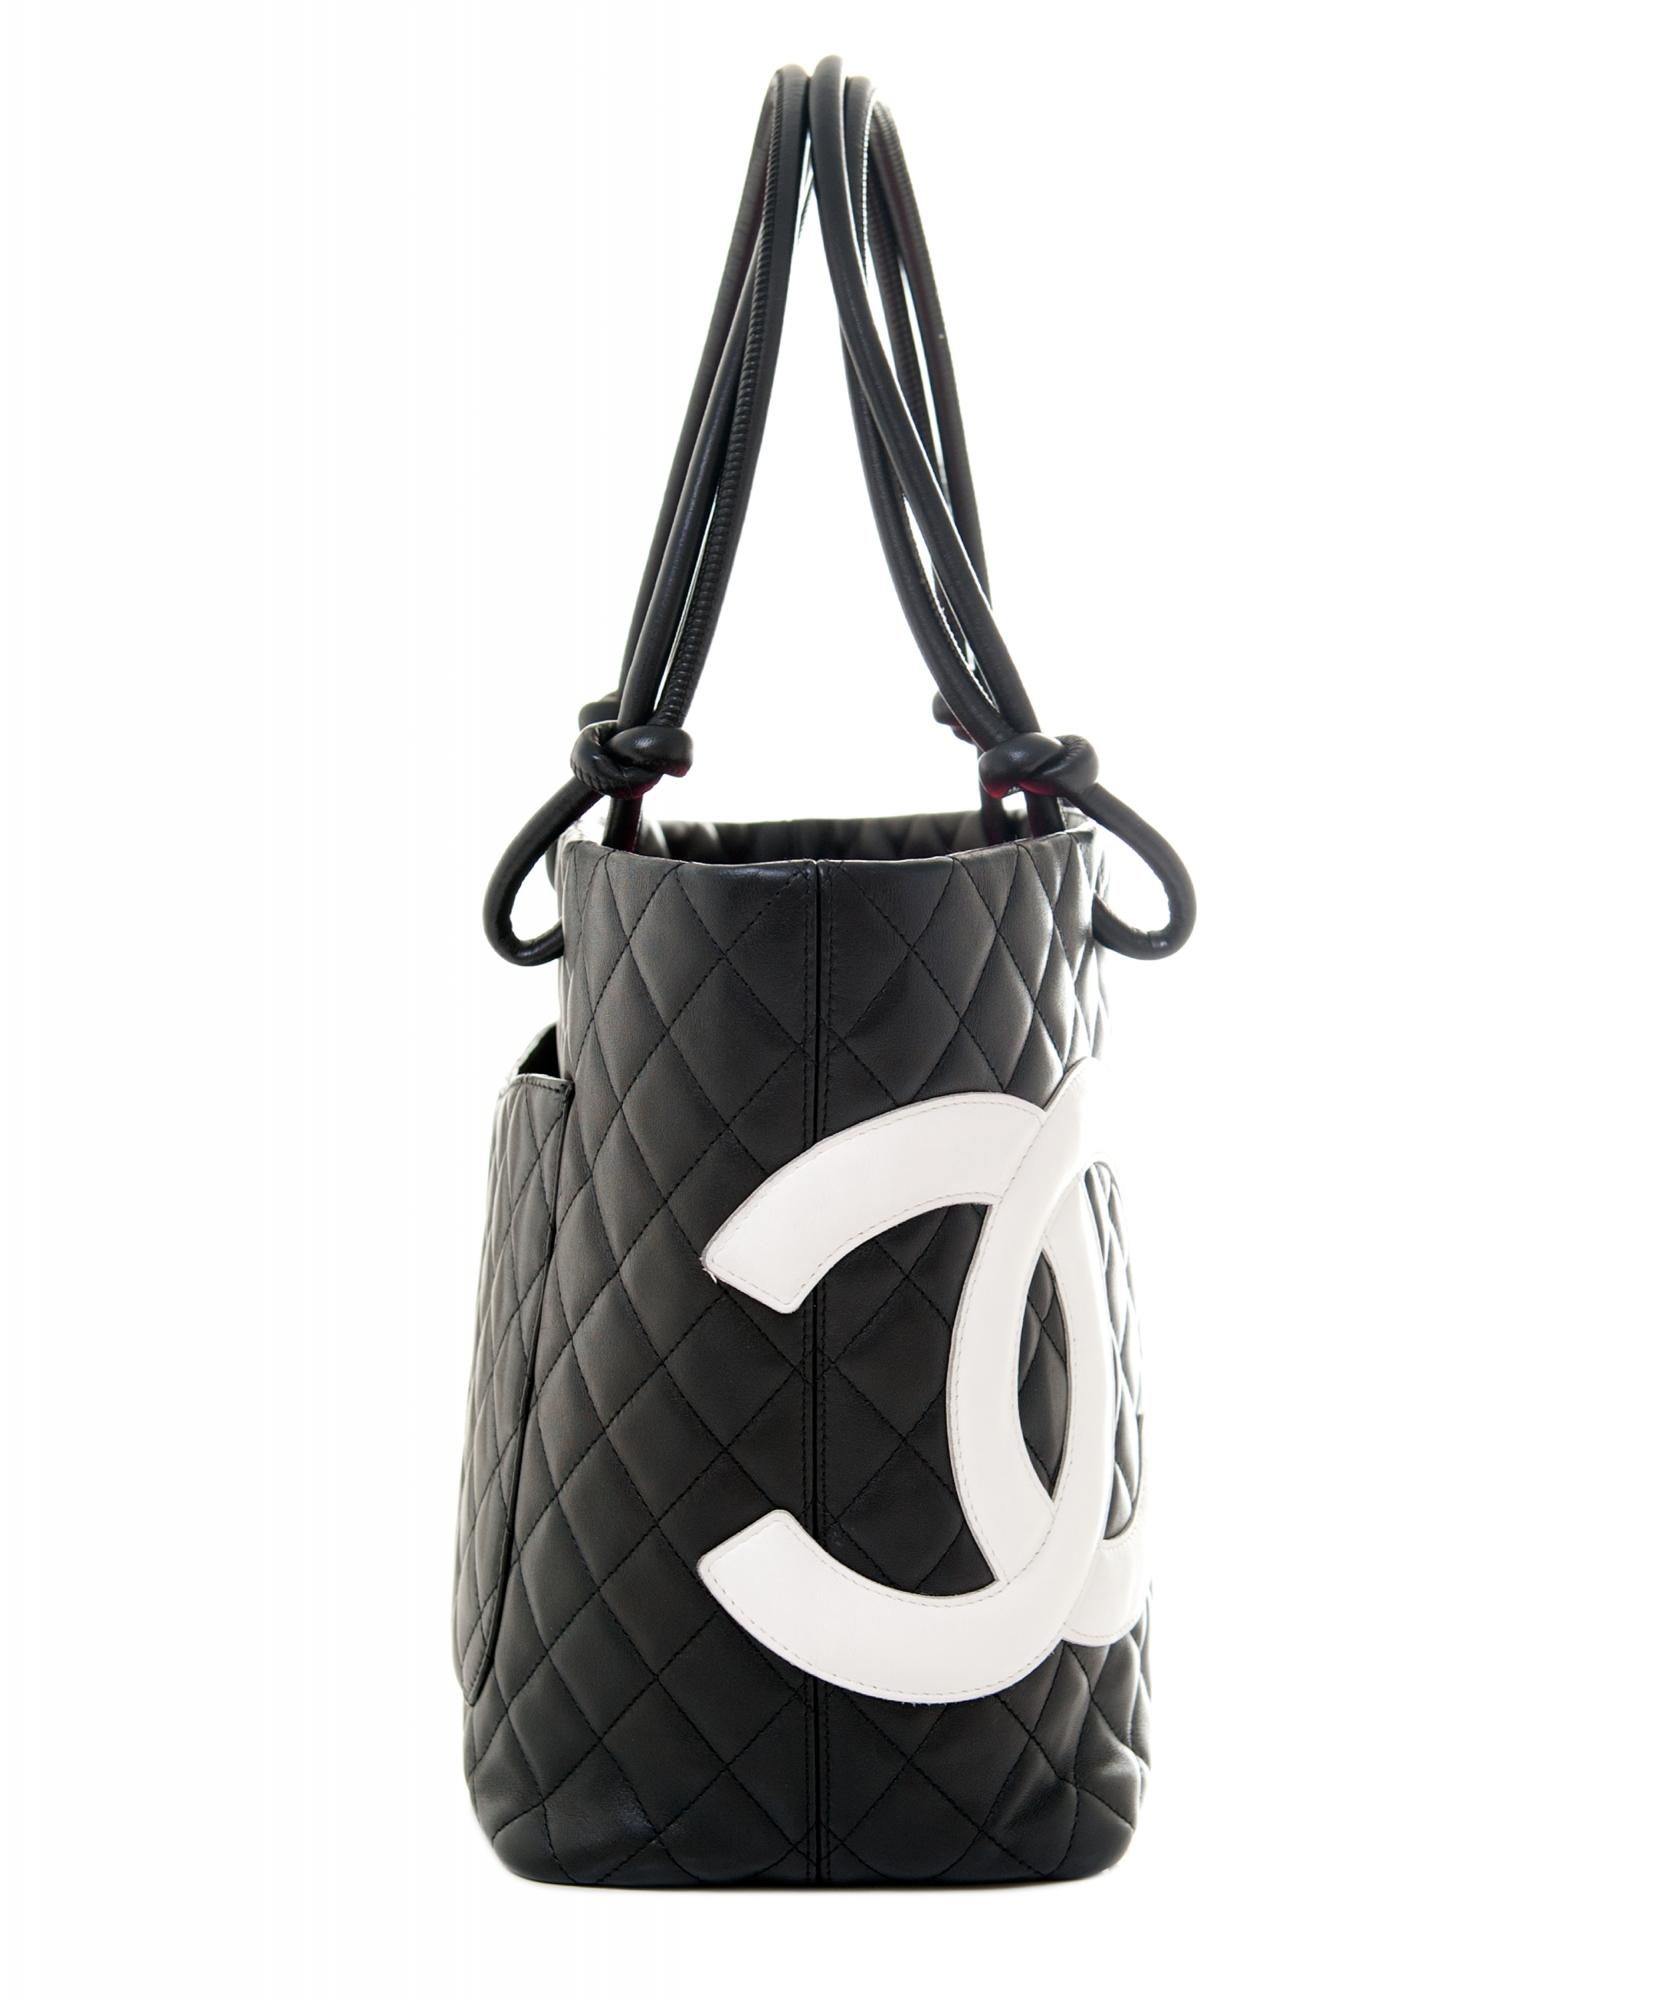 0806a754f2b5 Chanel Black Leather Ligne Cambon Tote Bag | La Doyenne